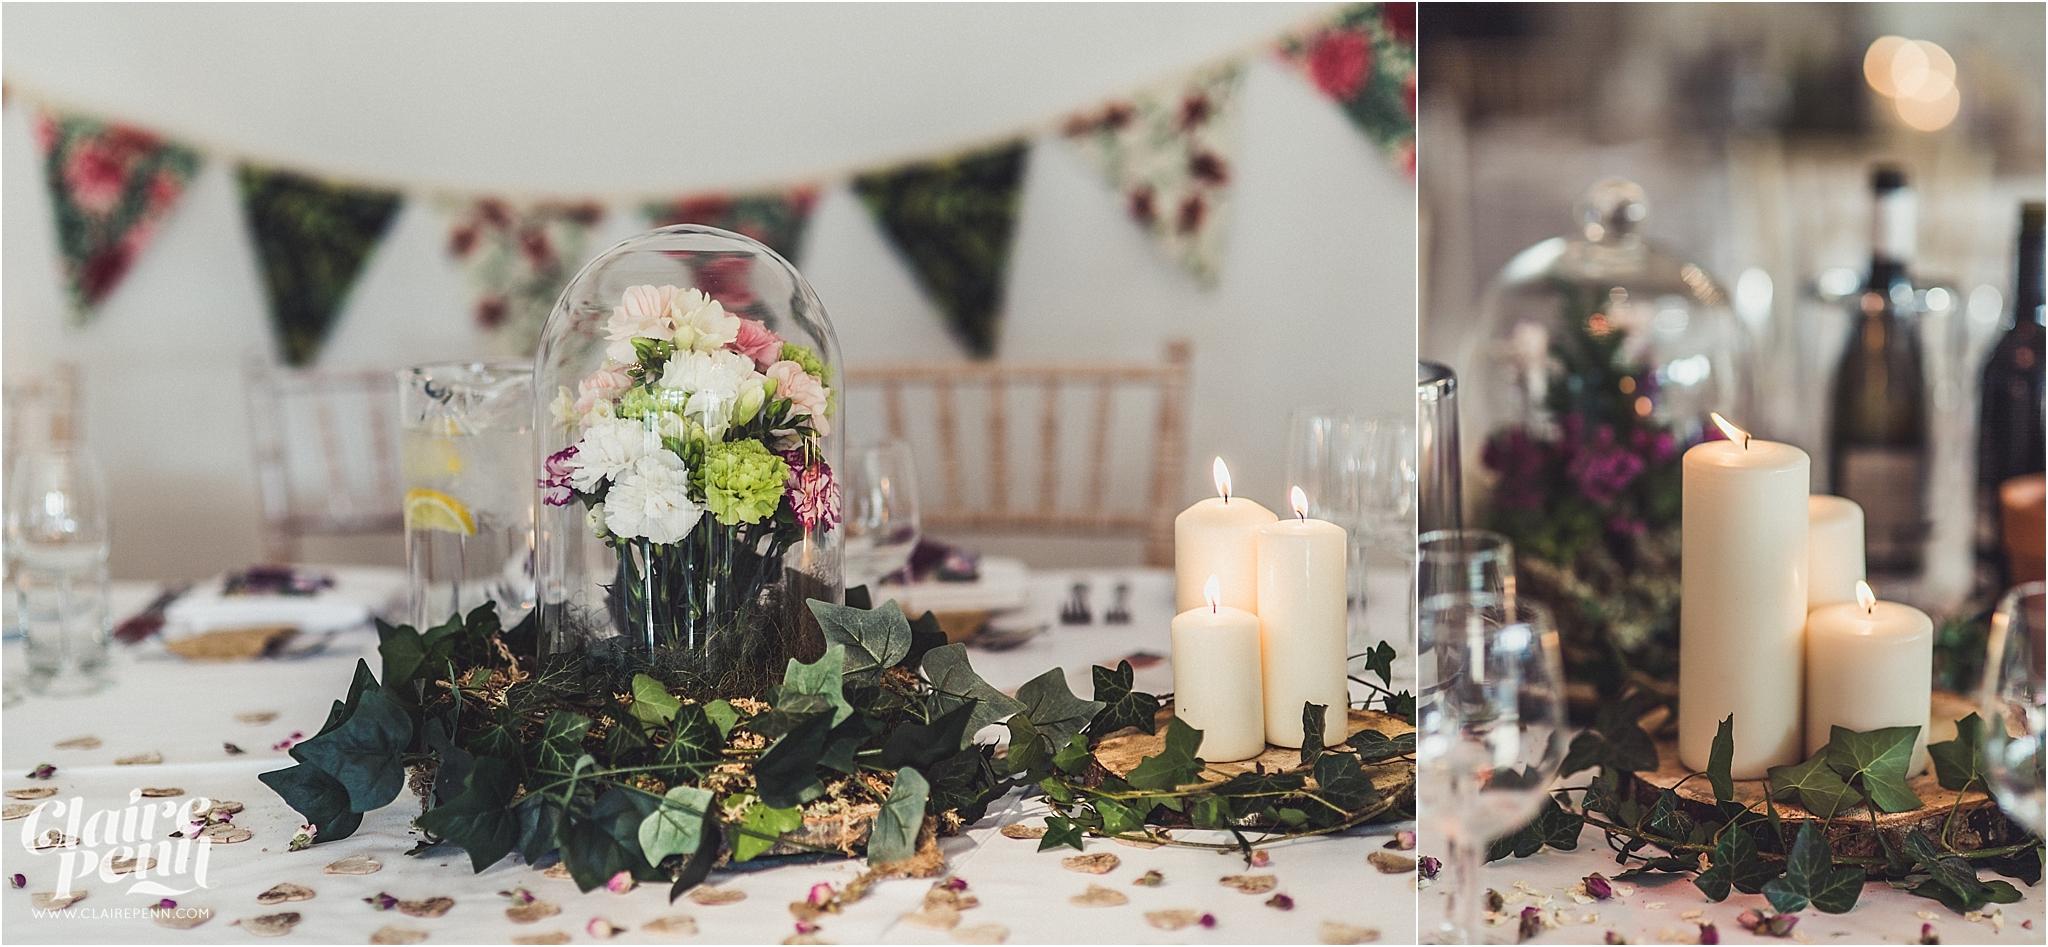 Iscoyd Park wedding, Whitchurch, Cheshire wedding photographer_0049.jpg